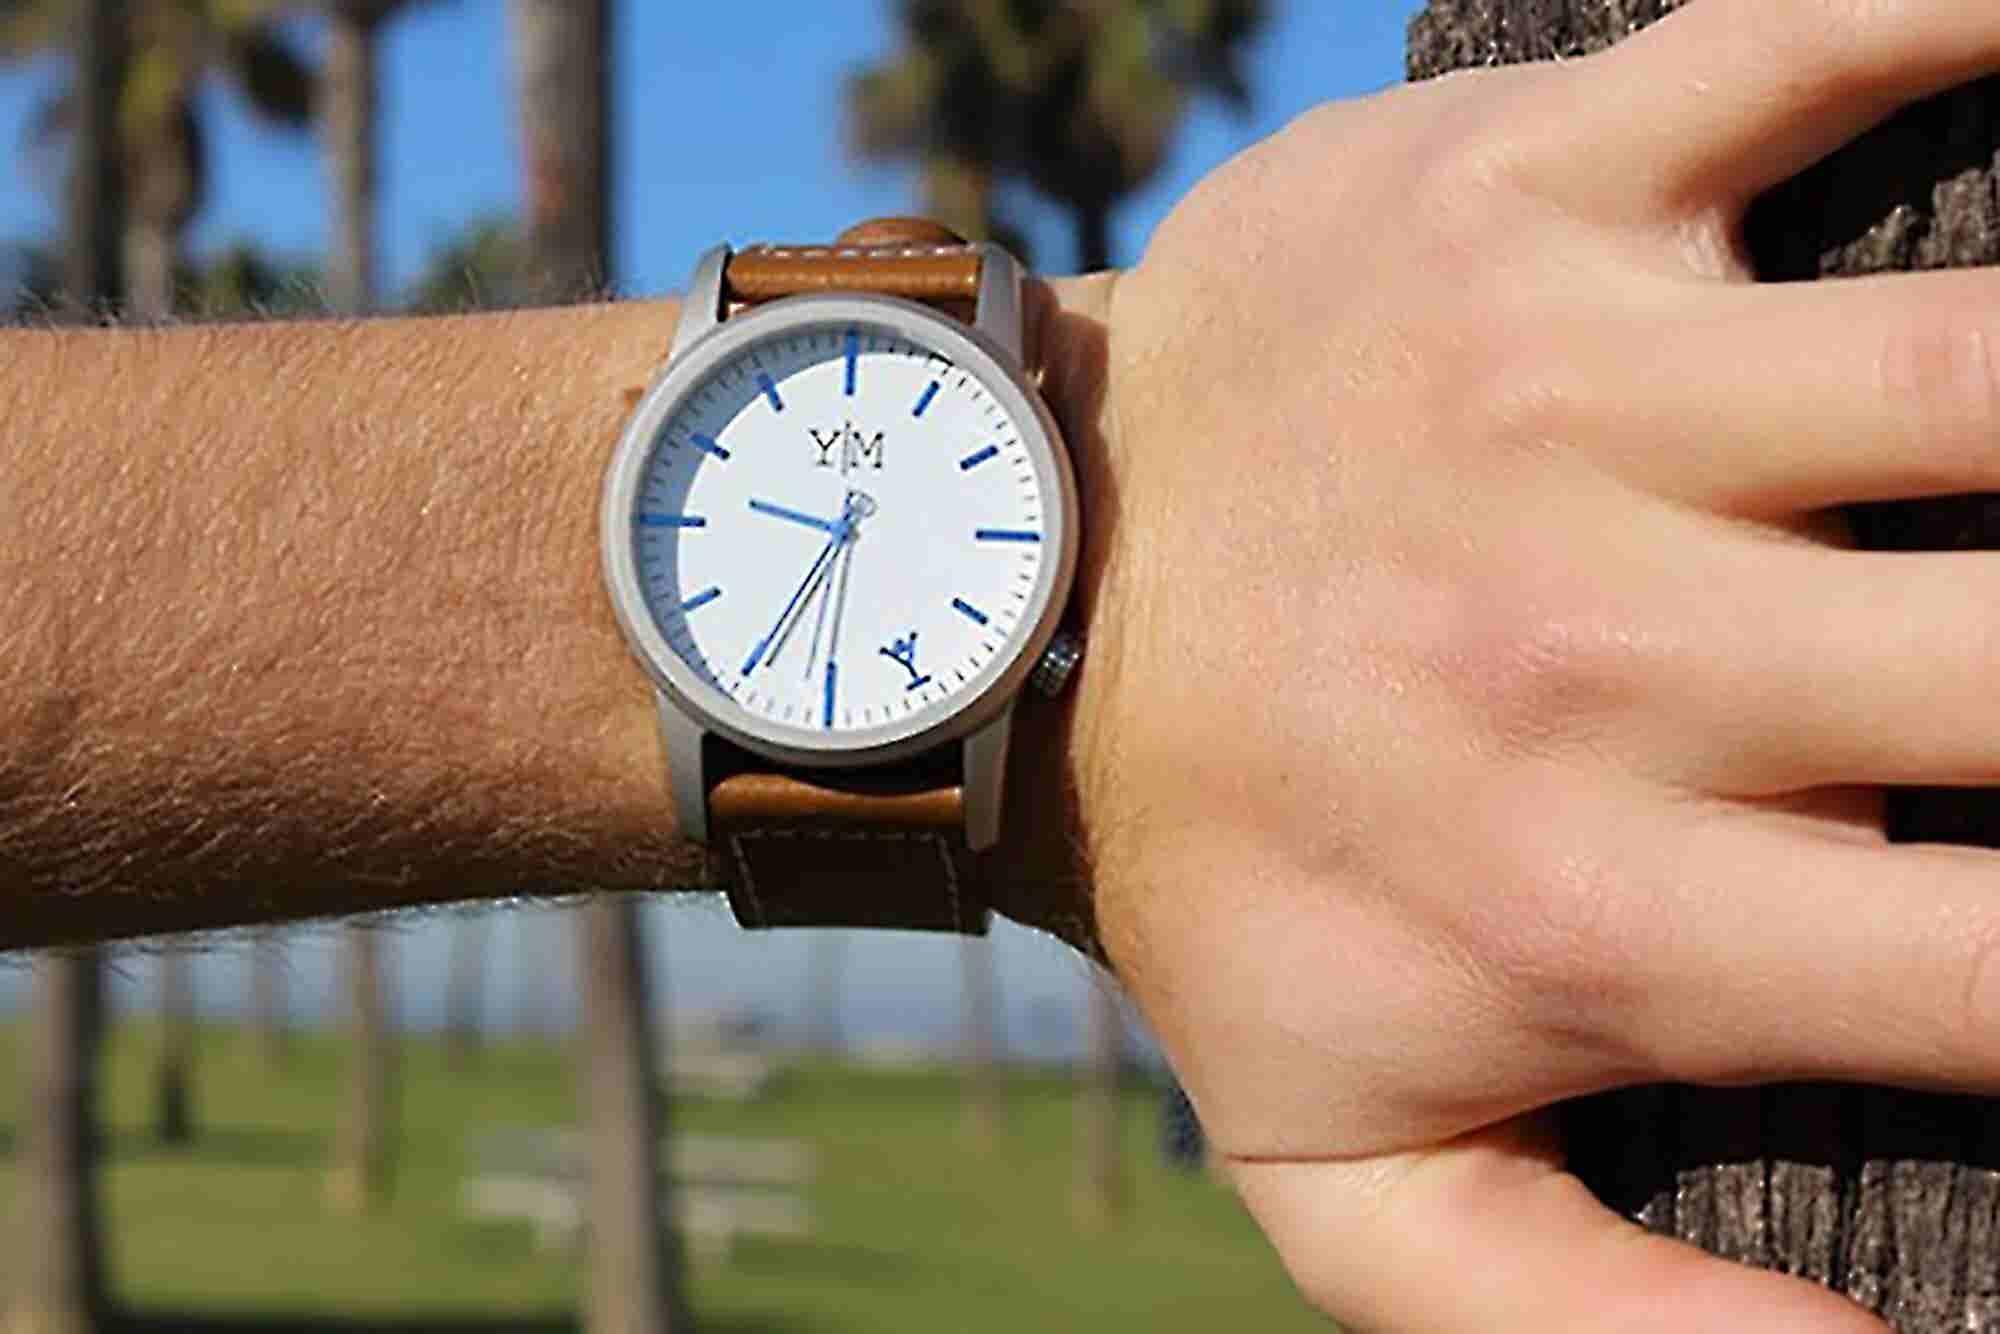 Student Raises $15K on Kickstarter Without Spending a Dime